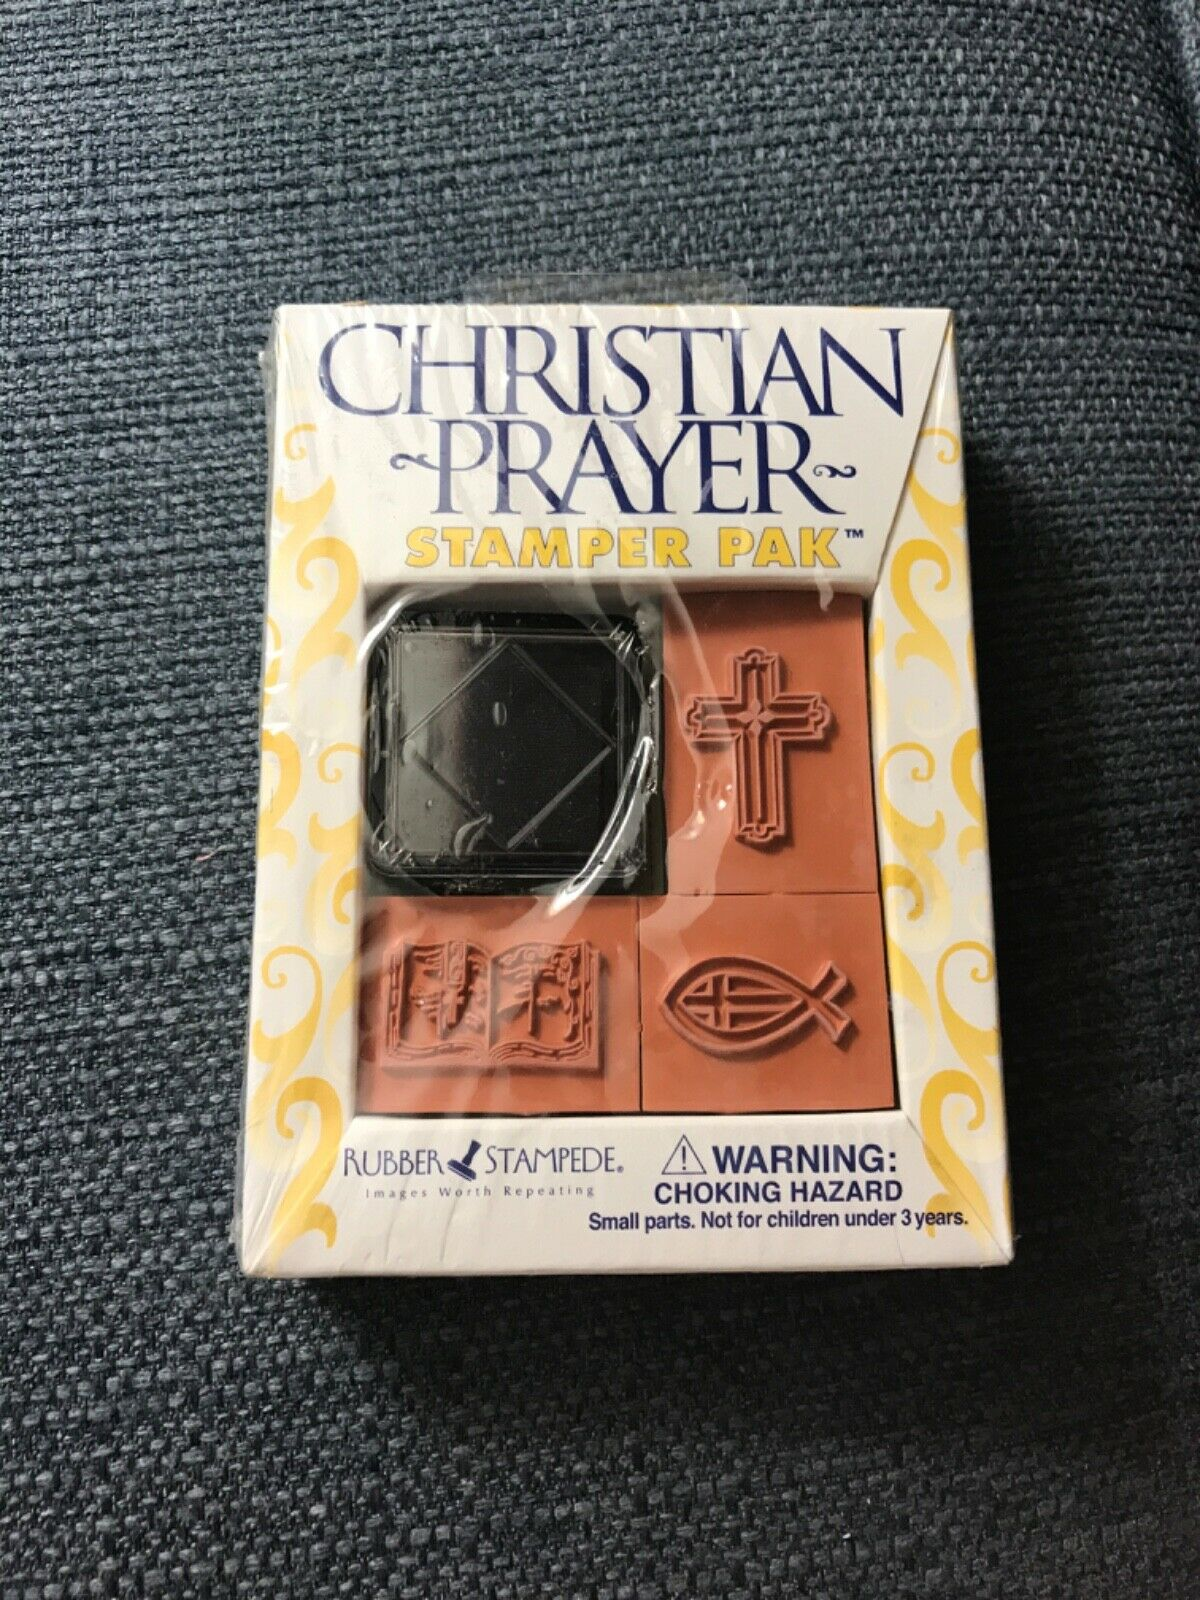 "New Rubber Stampede Stamper Pak ""Christian Prayer"" 3 sta"